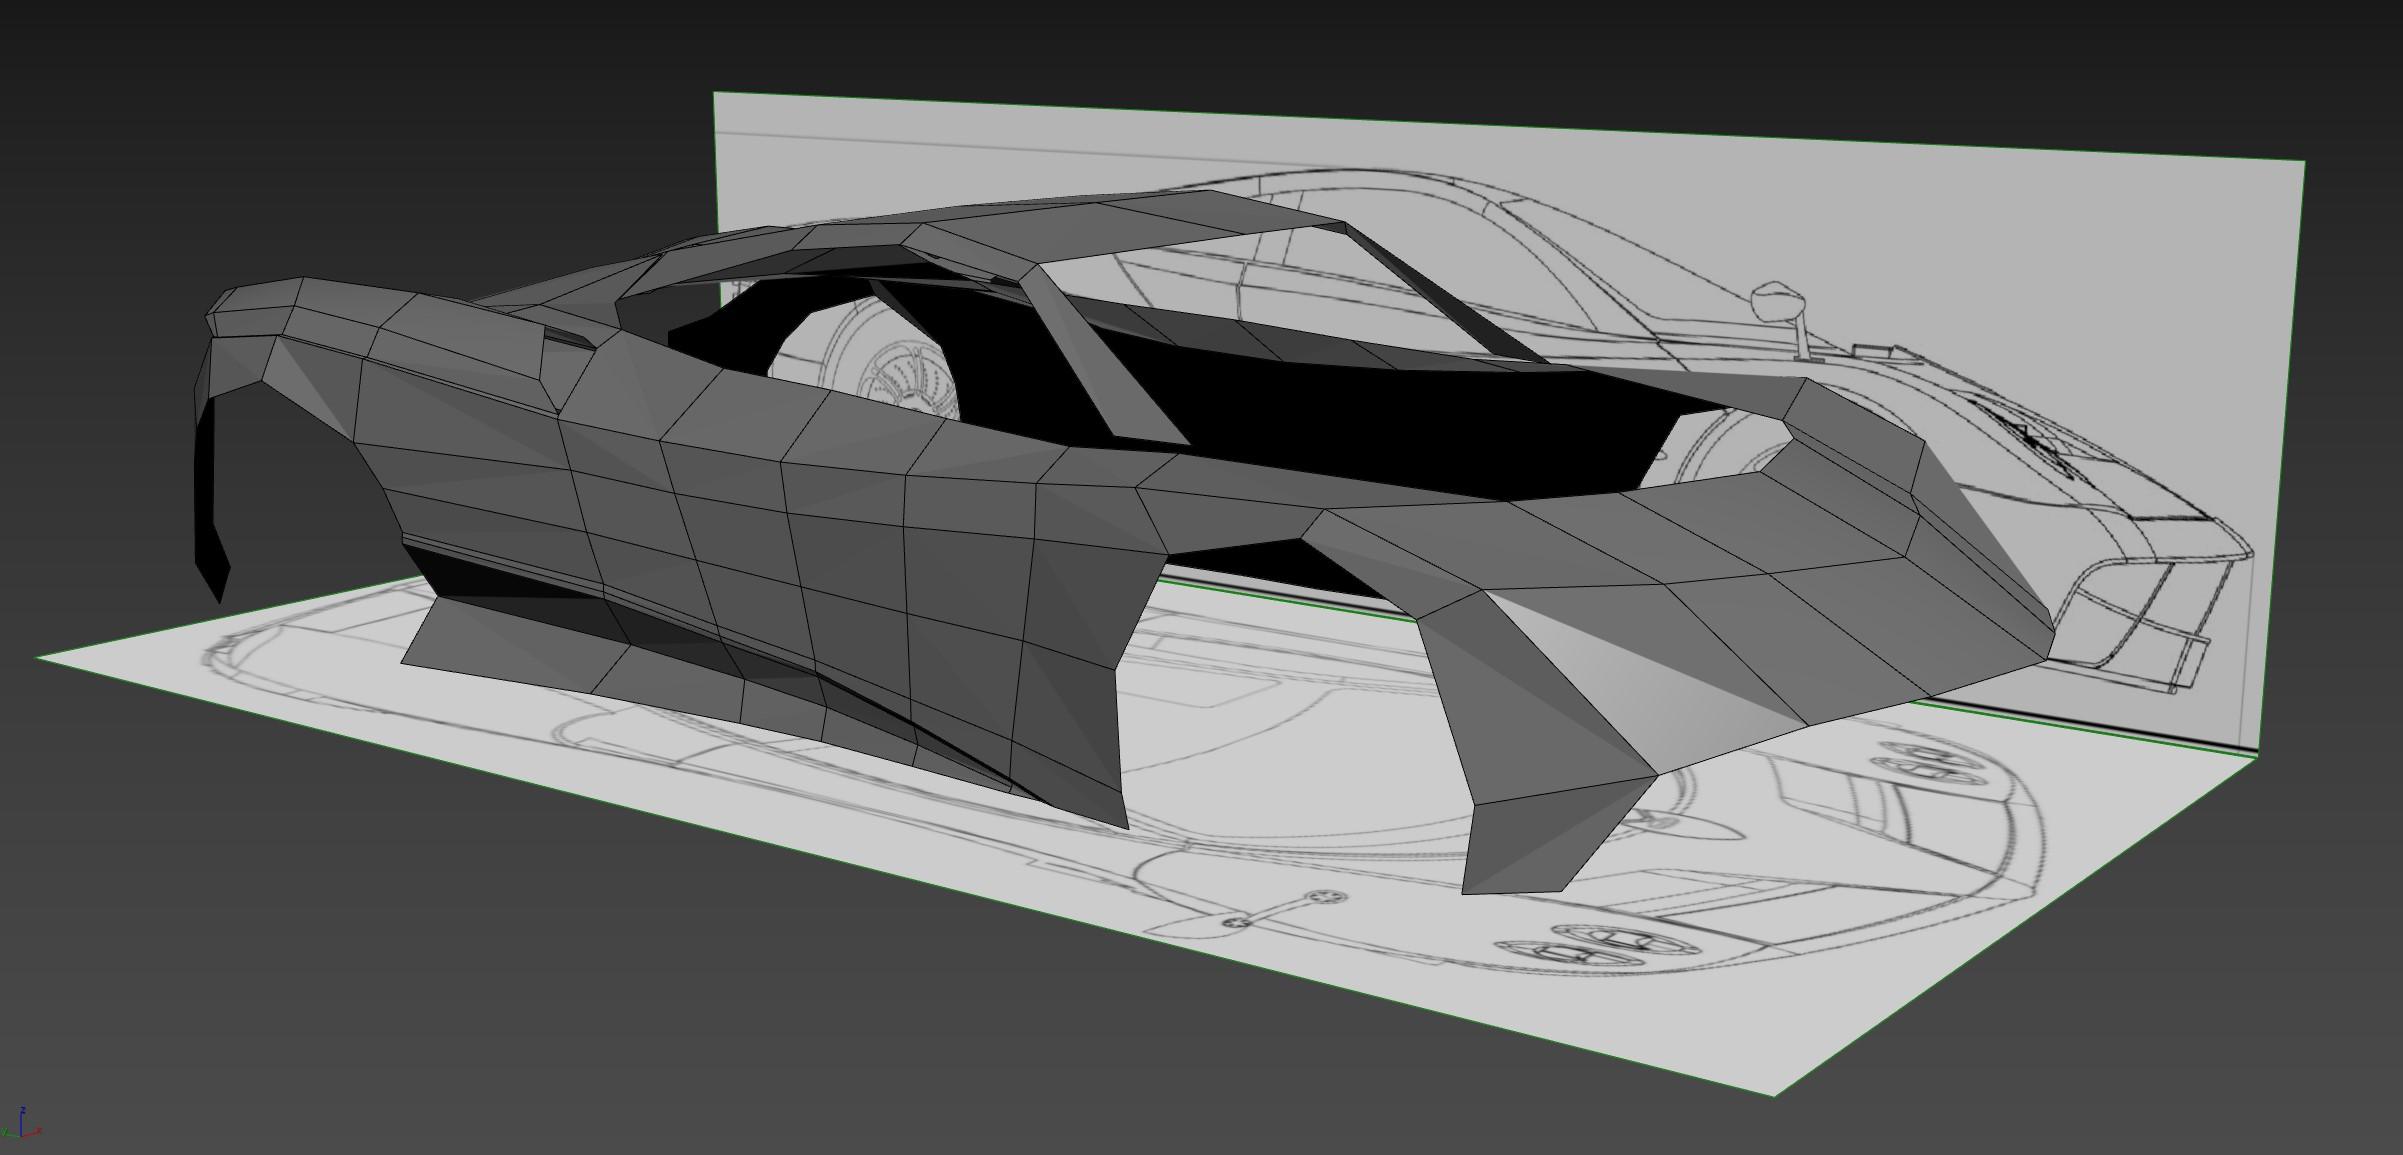 Pagani Huayra - Car Render Challenge 2019